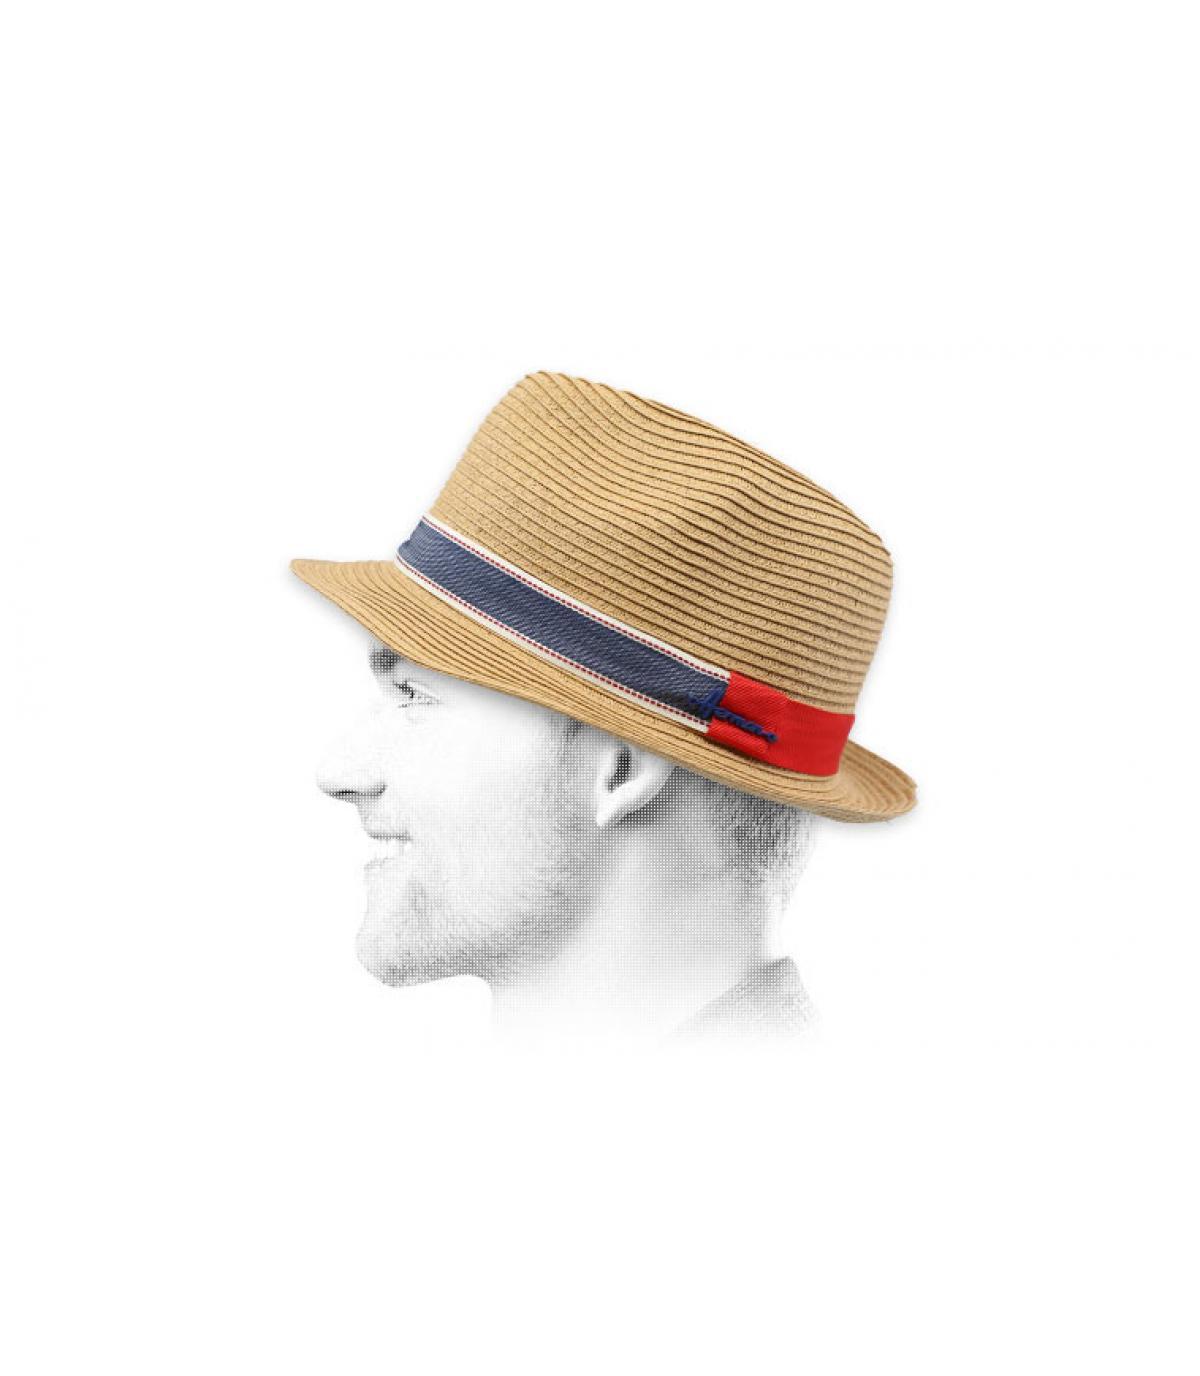 Trilby Strohhut Hutband zweifarbig